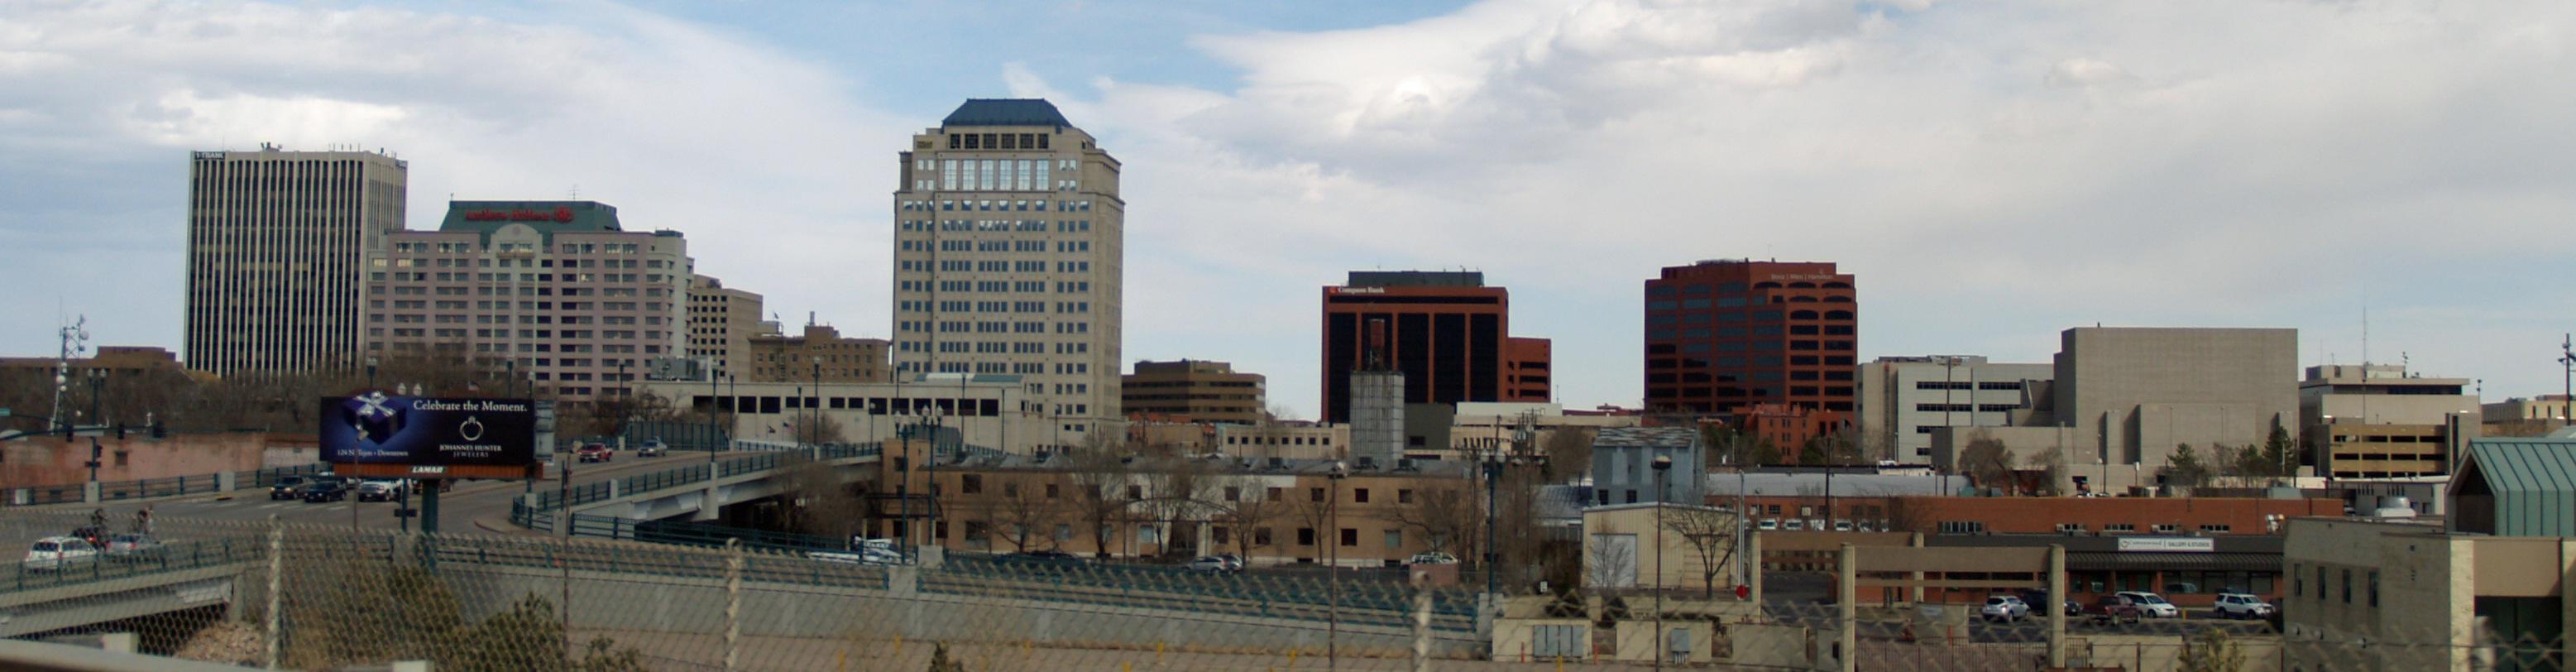 Downtown_Colorado_Springs_by_David_Shankbone_cropped.jpgcolorado city town